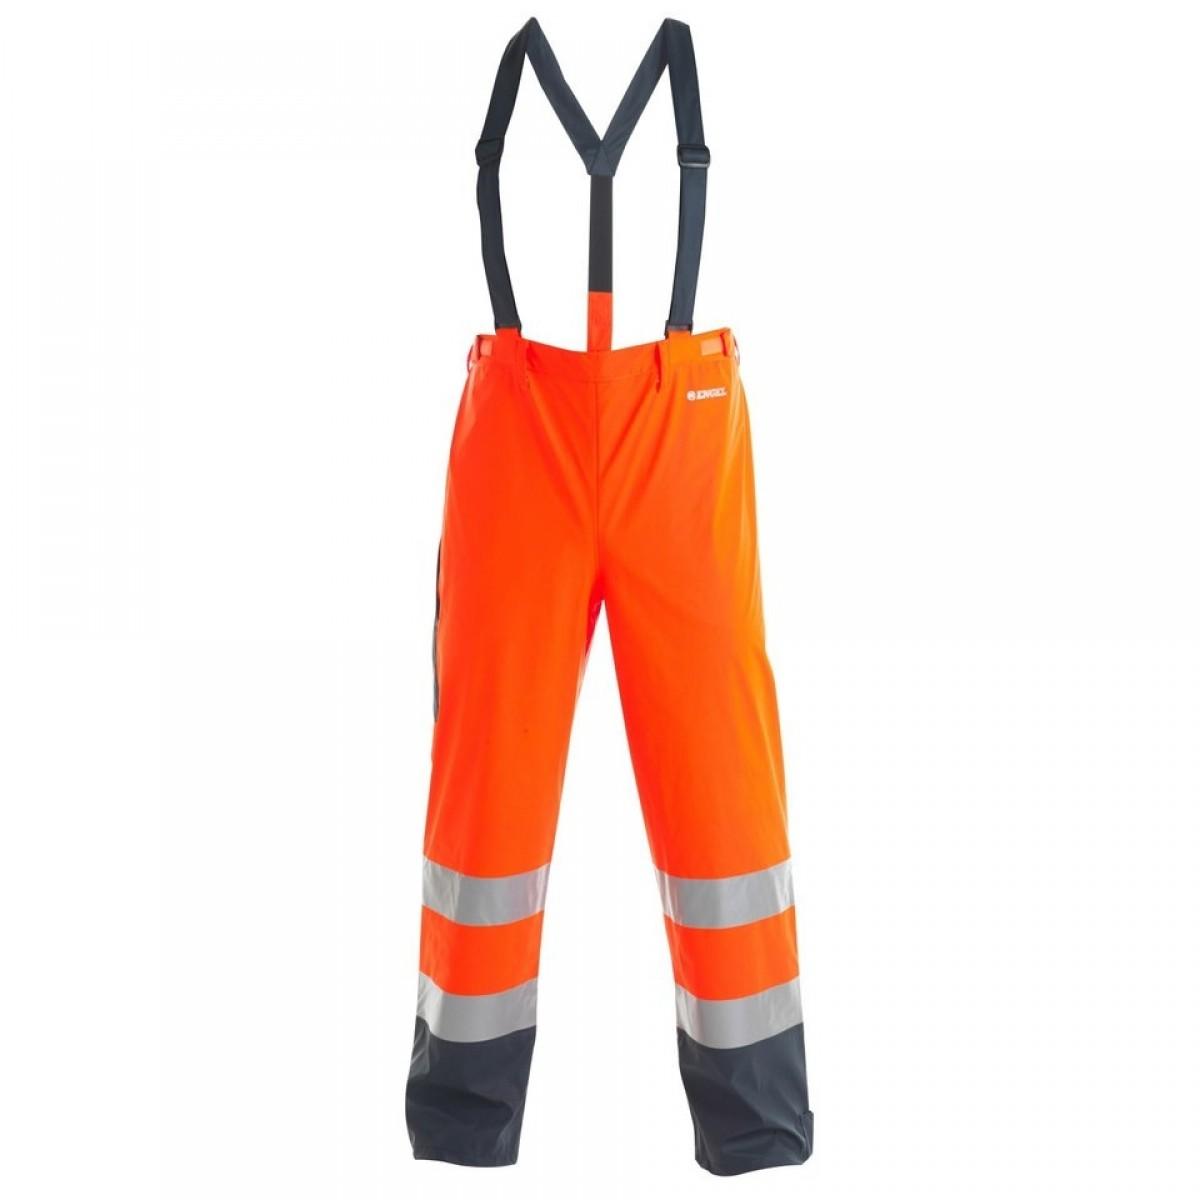 F. Engel Safety EN 20471 Regnbuks-34